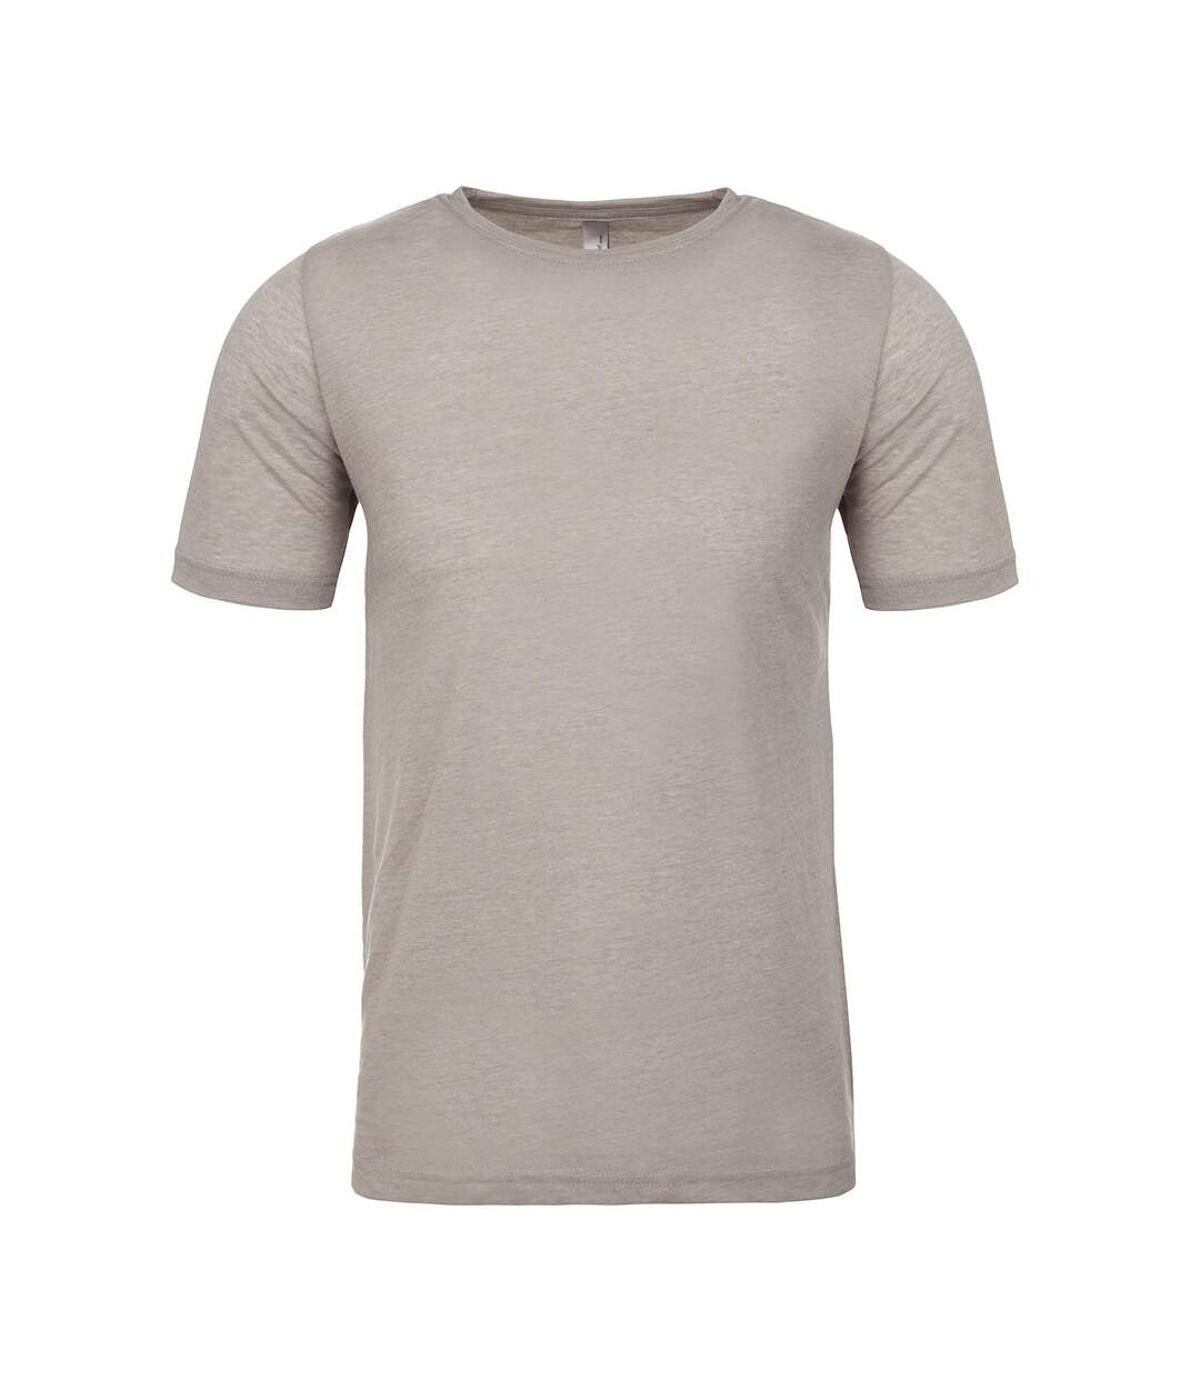 Next Level Mens Short-Sleeved T-Shirt (Silver) - UTPC4182